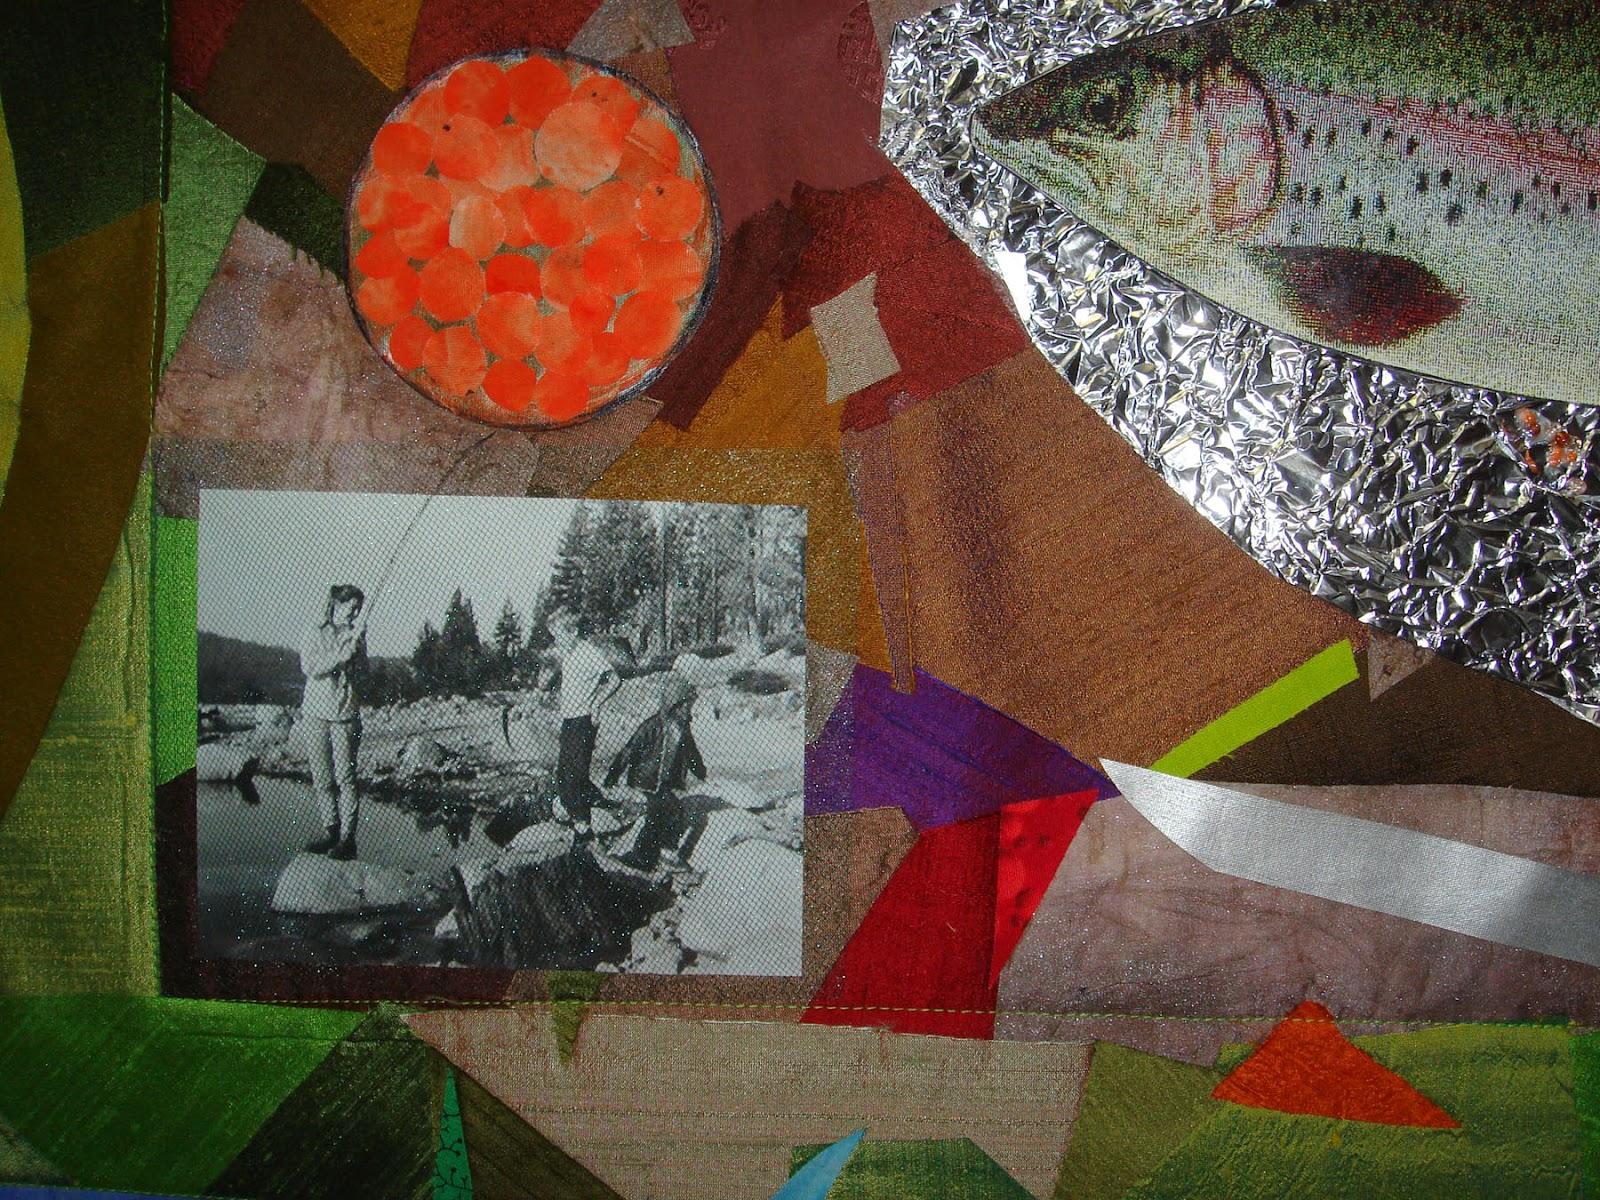 http://3.bp.blogspot.com/-ZEAFL2Ehpk8/VANzWCHQTbI/AAAAAAAAAdQ/0ySIo0NWoH0/s1600/Porcella.Yvonne.Shake'nBake.DETAIl.jpg